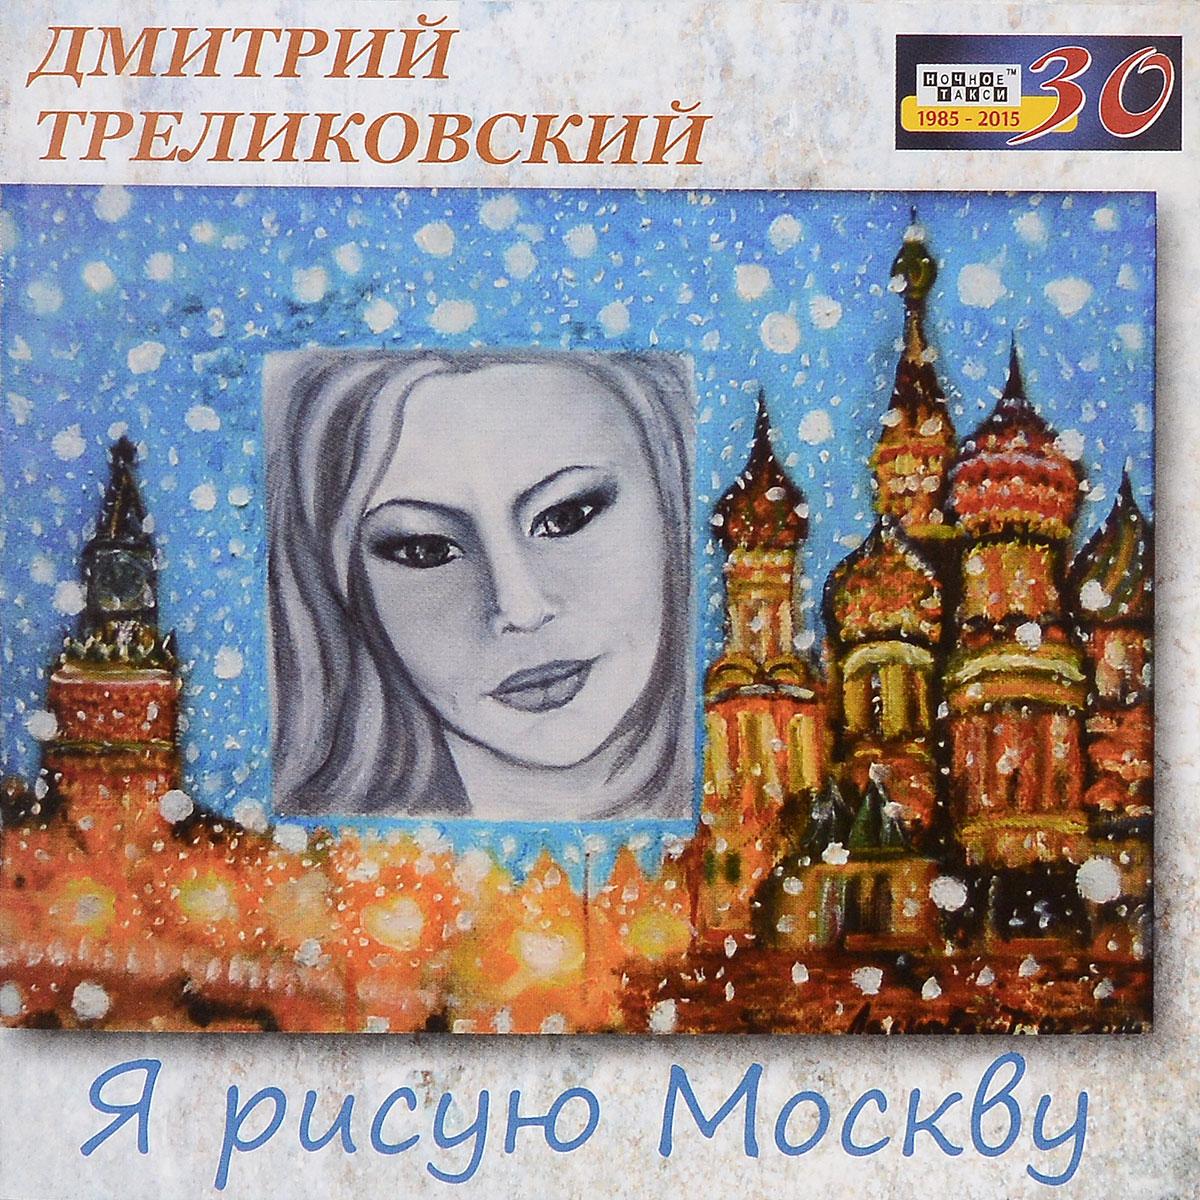 Дмитрий Треликовский. Я рисую Mоскву